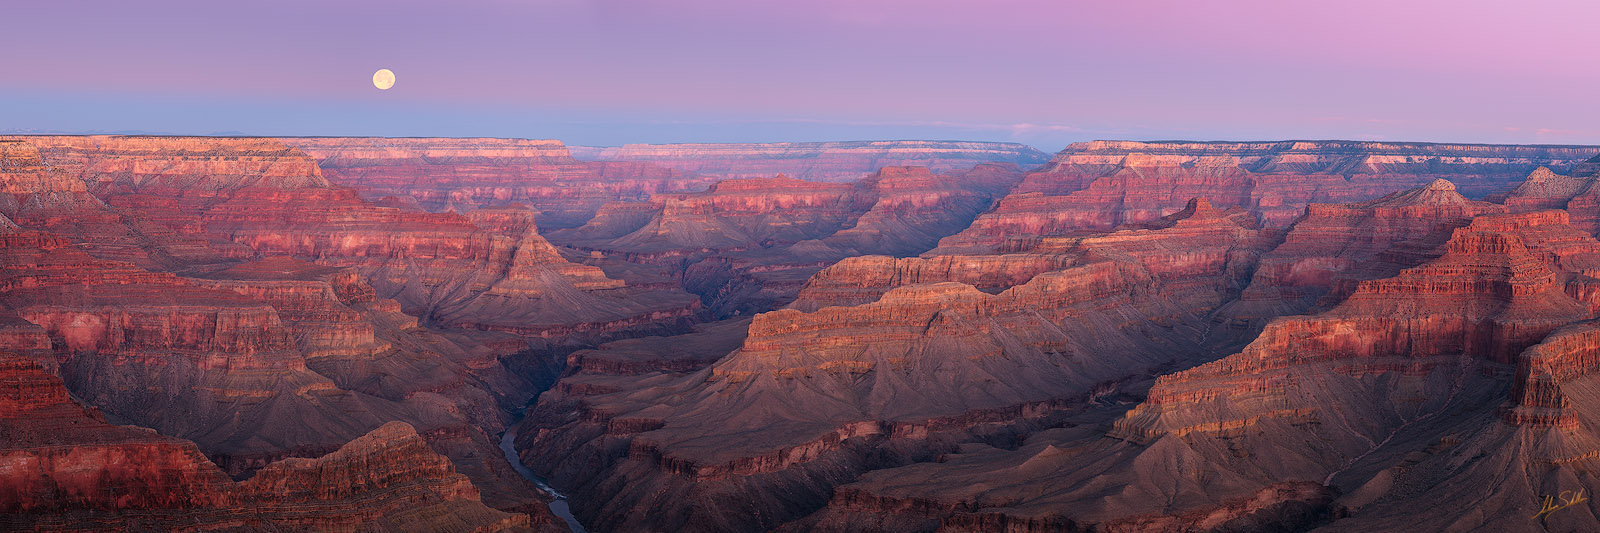 AZ, Arizona, Colorado River, full moon, Grand Canyon, Moon, National Park, Pano, Panorama, Panoramic, South Rim, Winter, photo